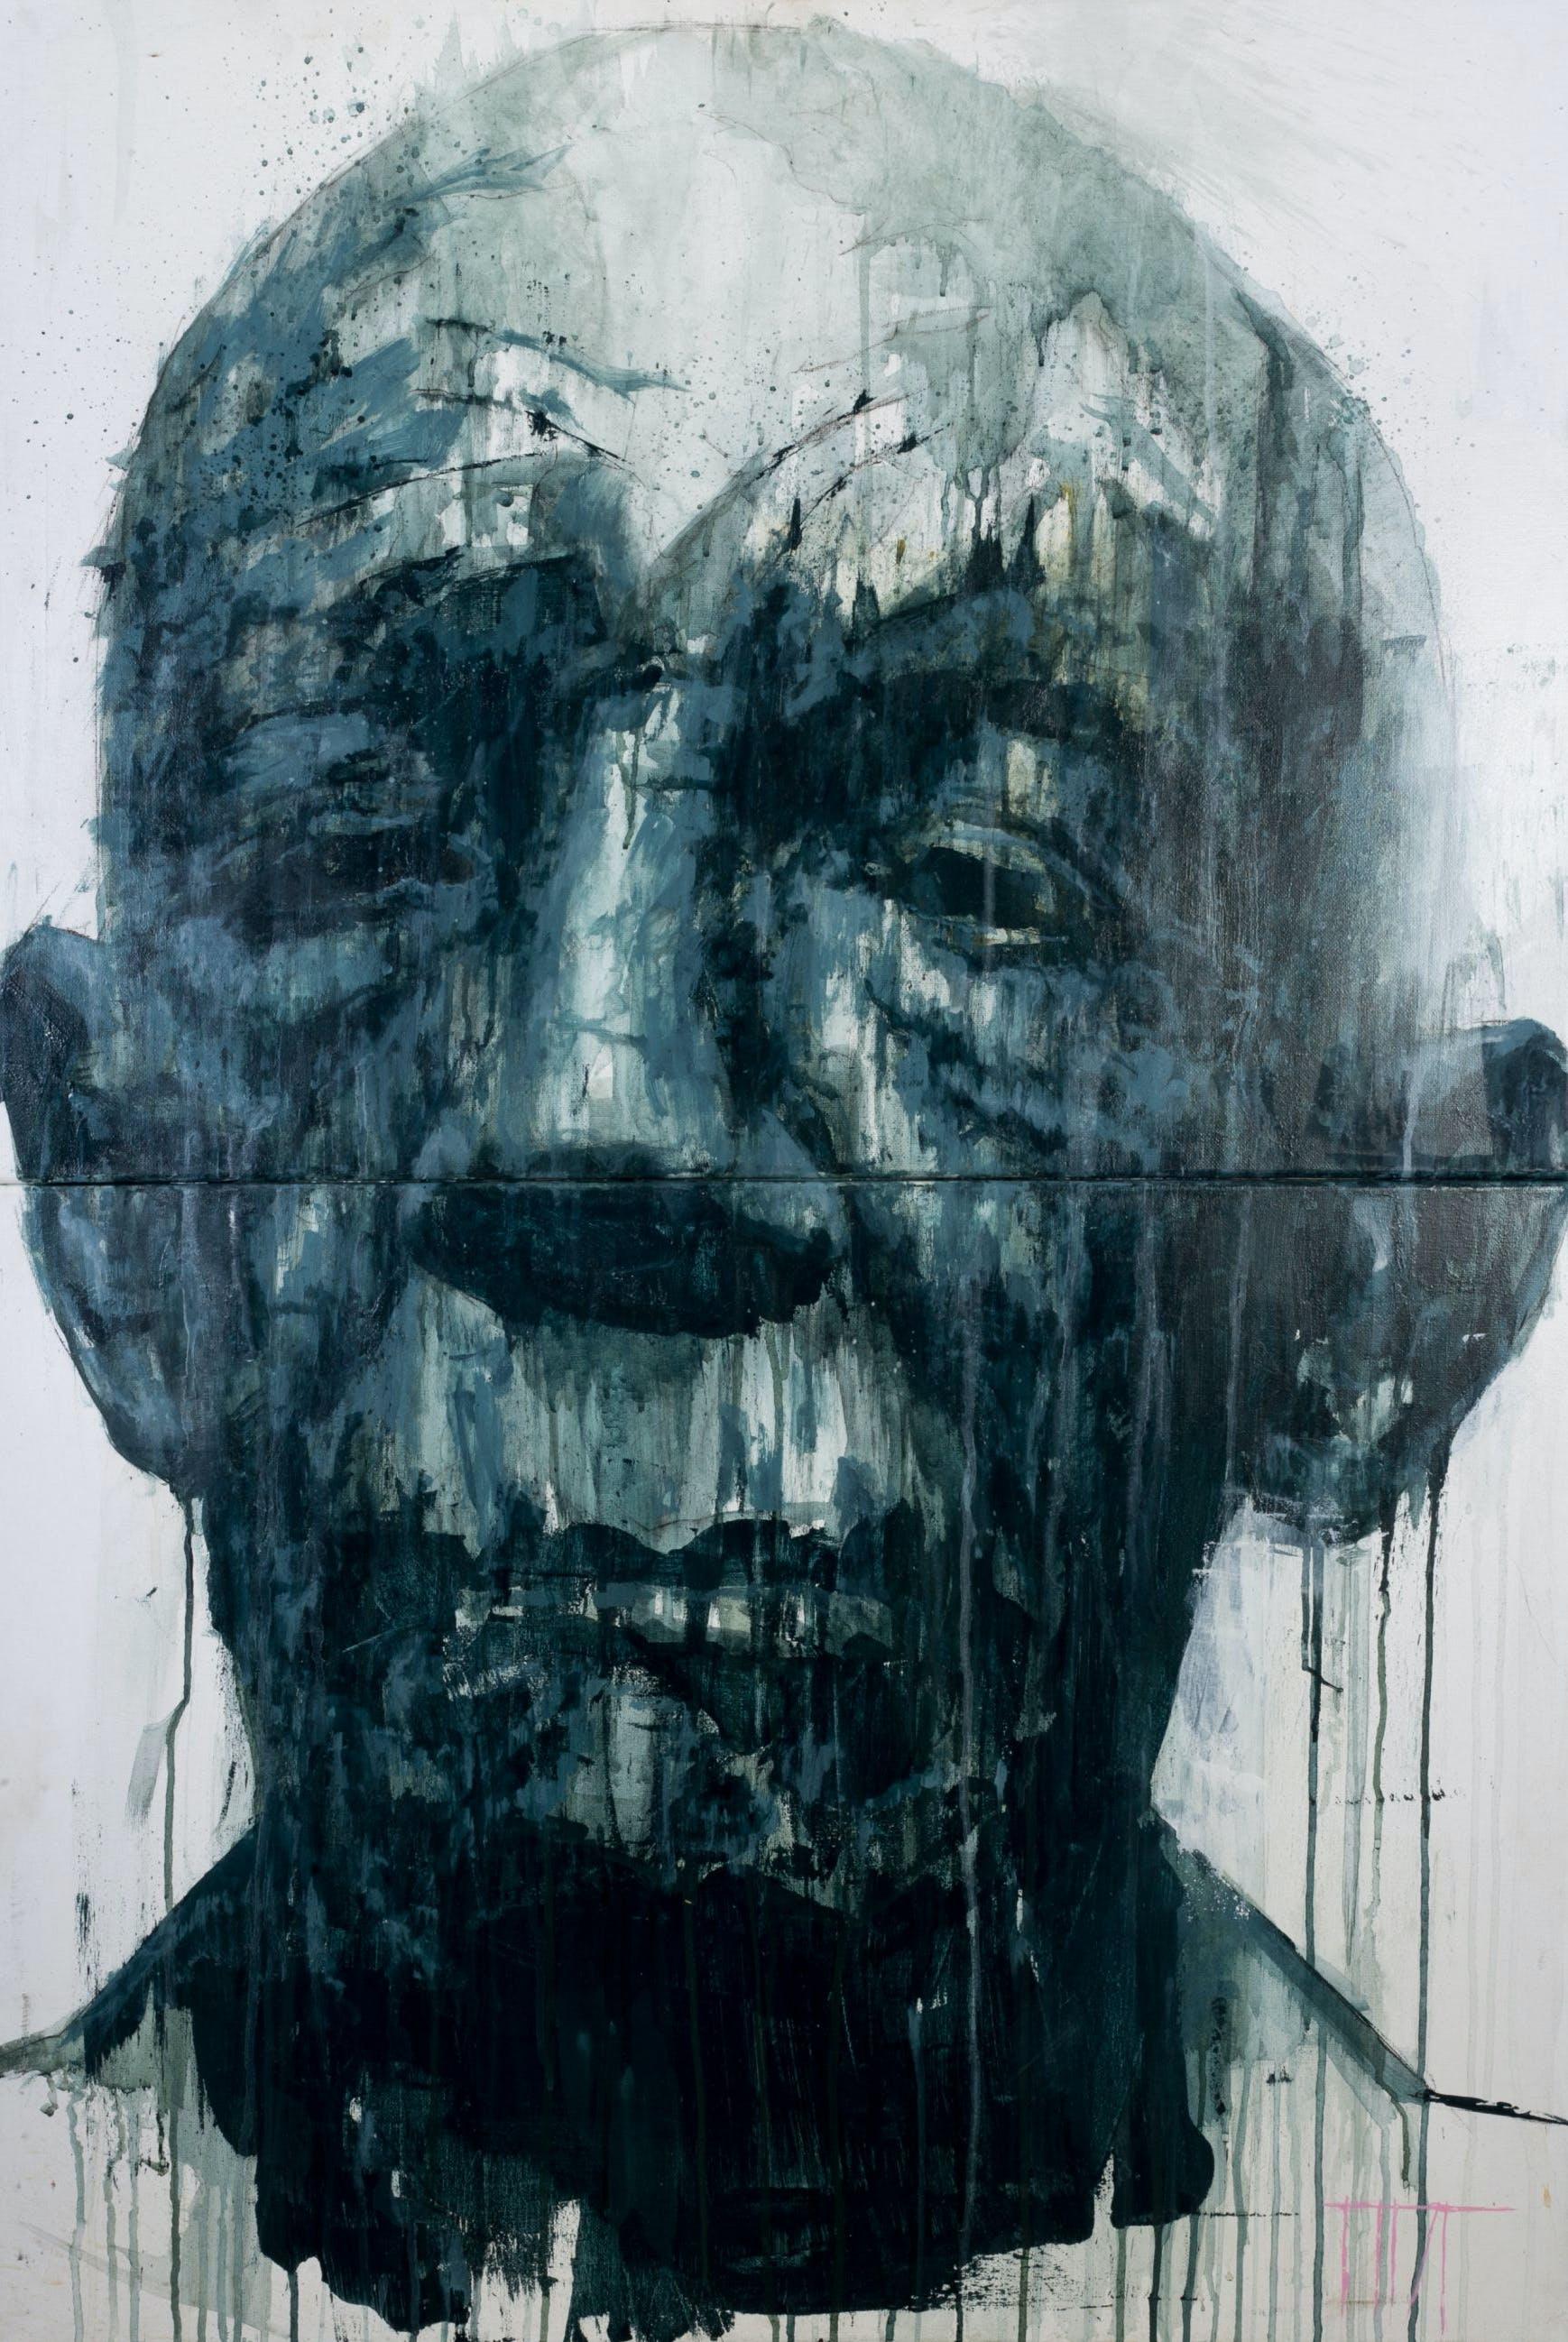 THE HYDE'S ASYLUM: PEINTRE PORTRAITISTE EXPRESSIONNISTE